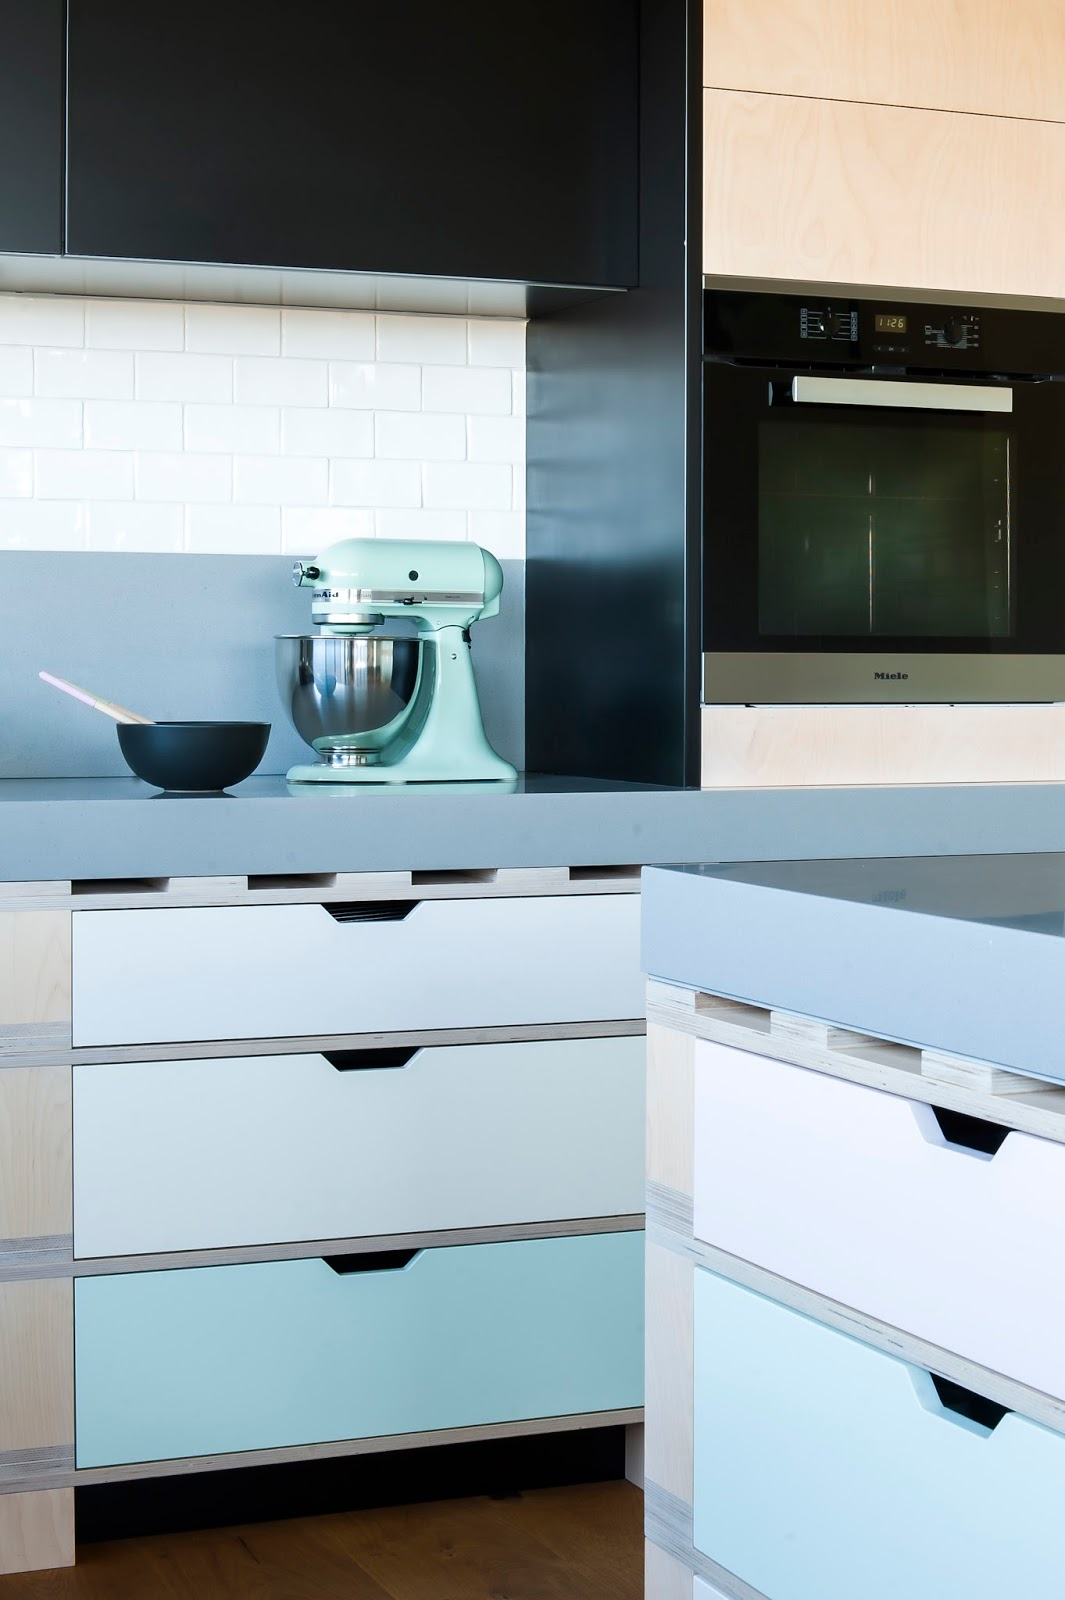 Minosa: A unique kitchen design solution based on a palette